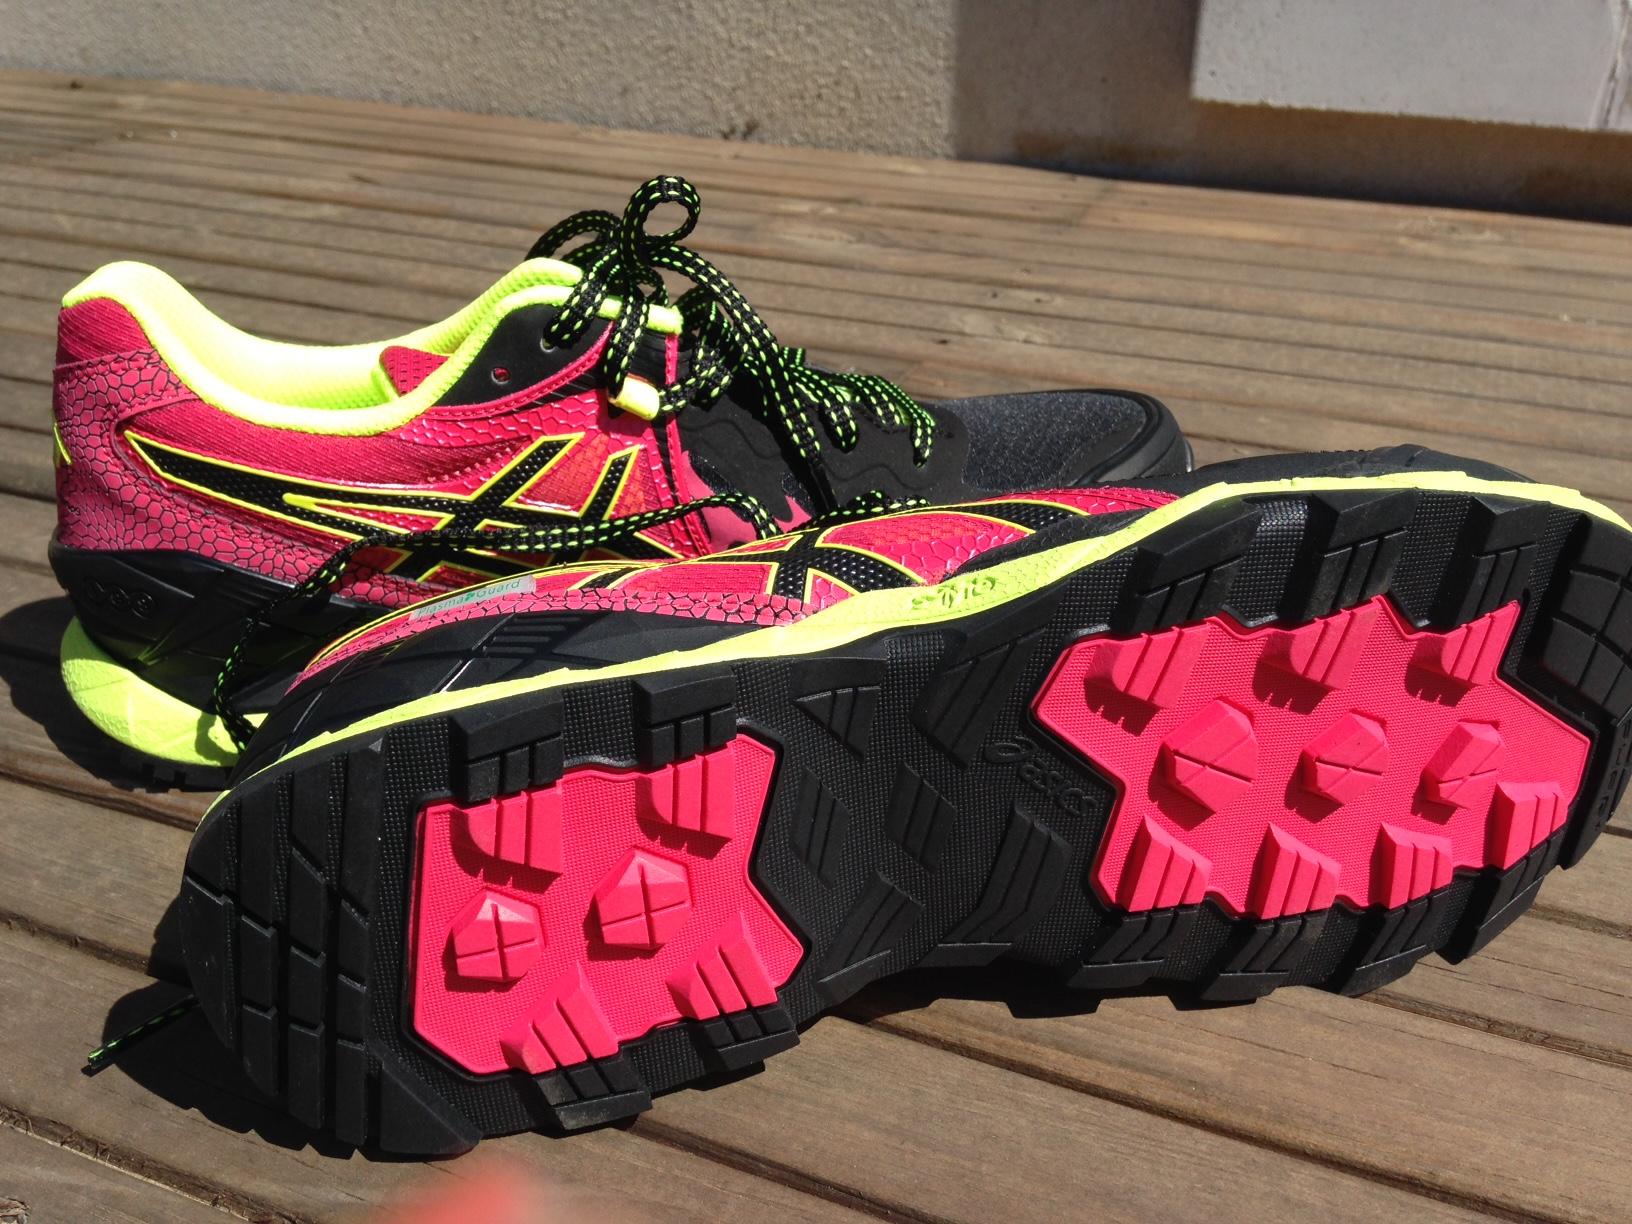 U U U Fuji Asics Teste Endurance Plasmaguard Run Run Run wISxF5